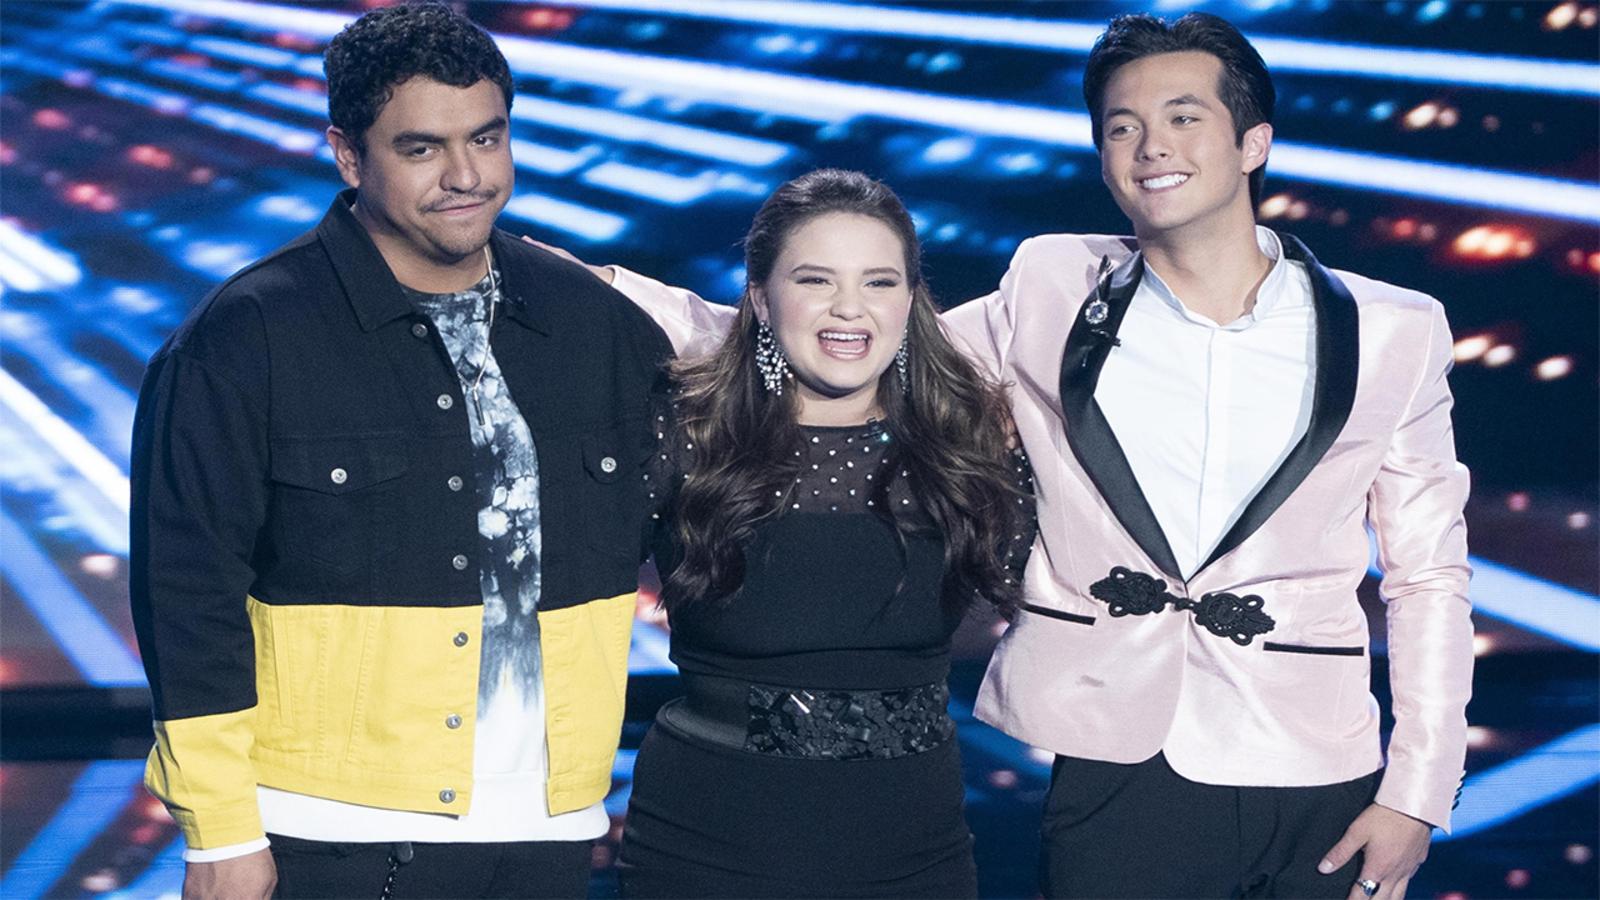 'American Idol' finale: Fans decide between final 3